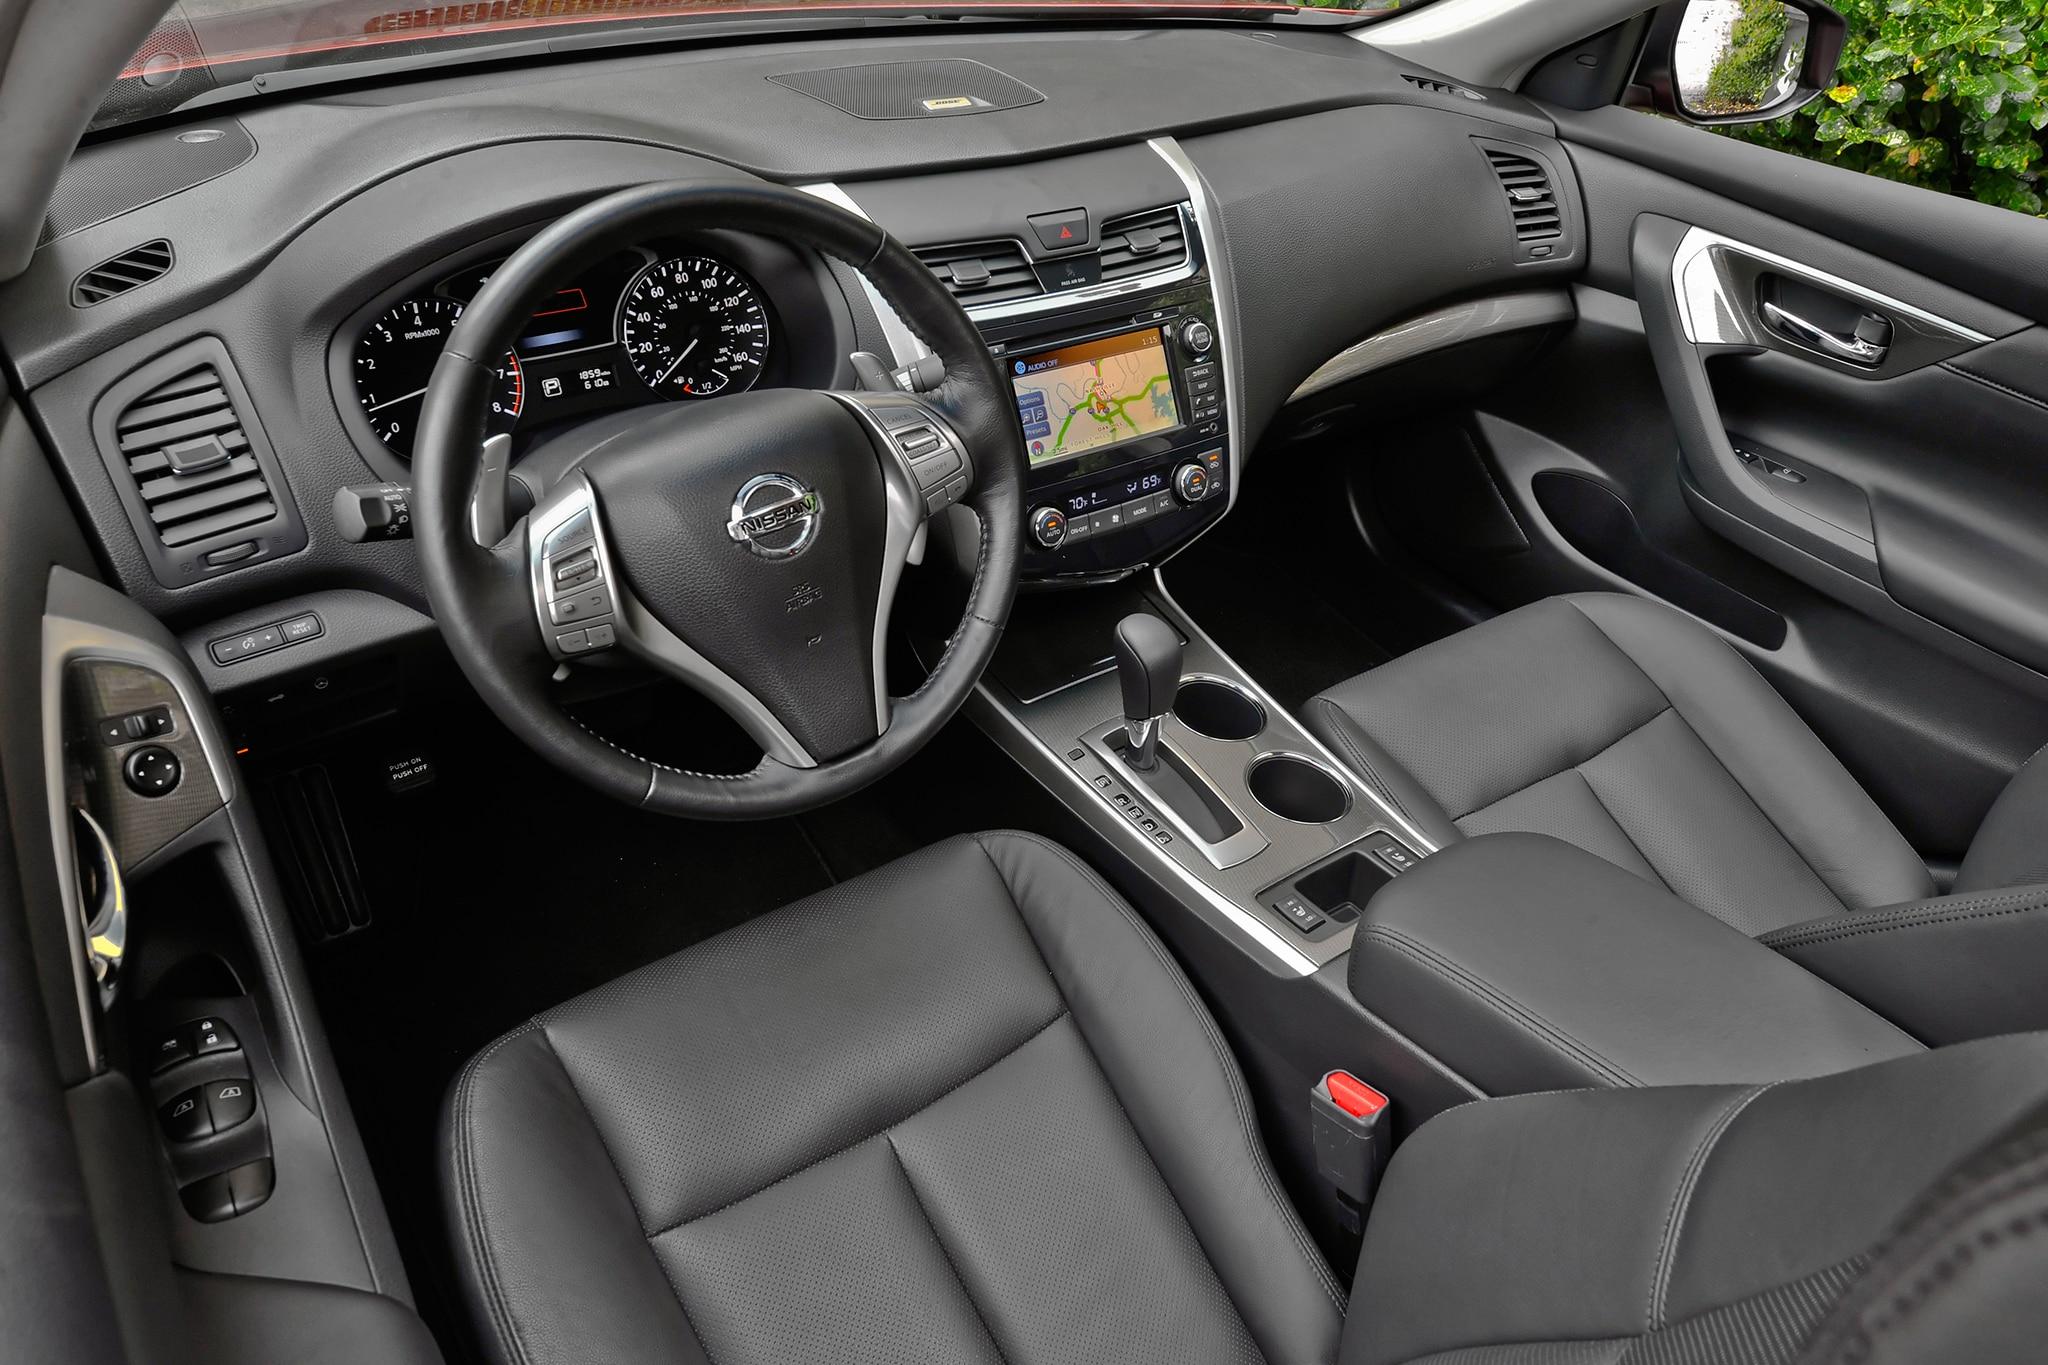 Charming 2014 Nissan Altima